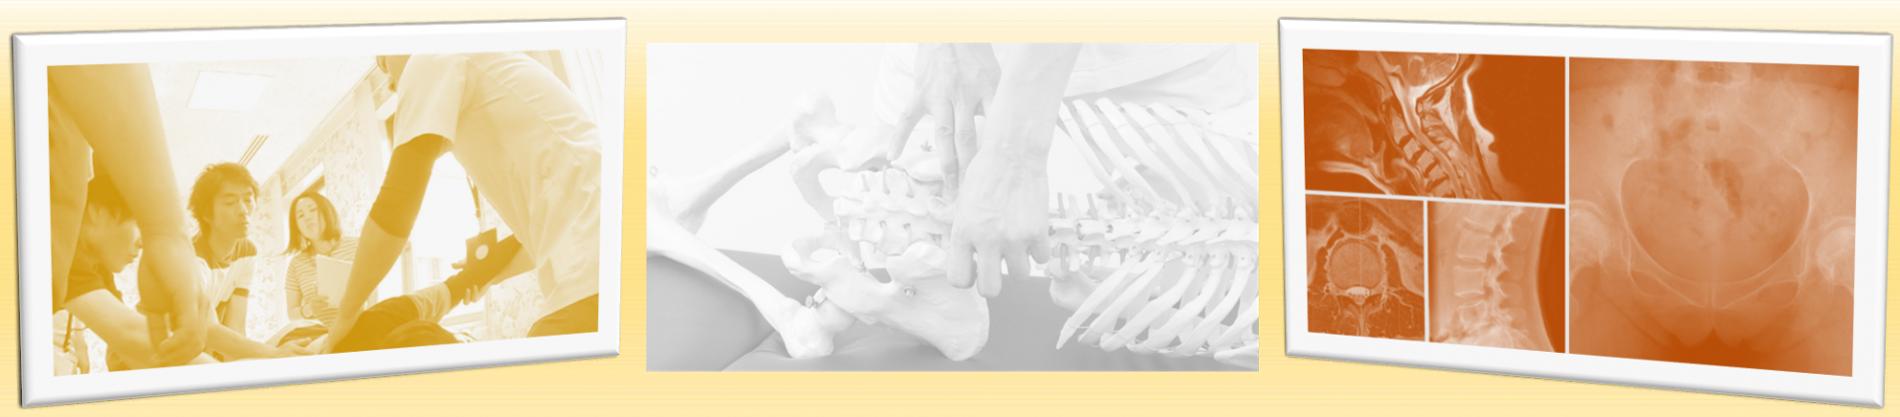 AKA治療を更に進化させたAKS治療を極めるセミナー